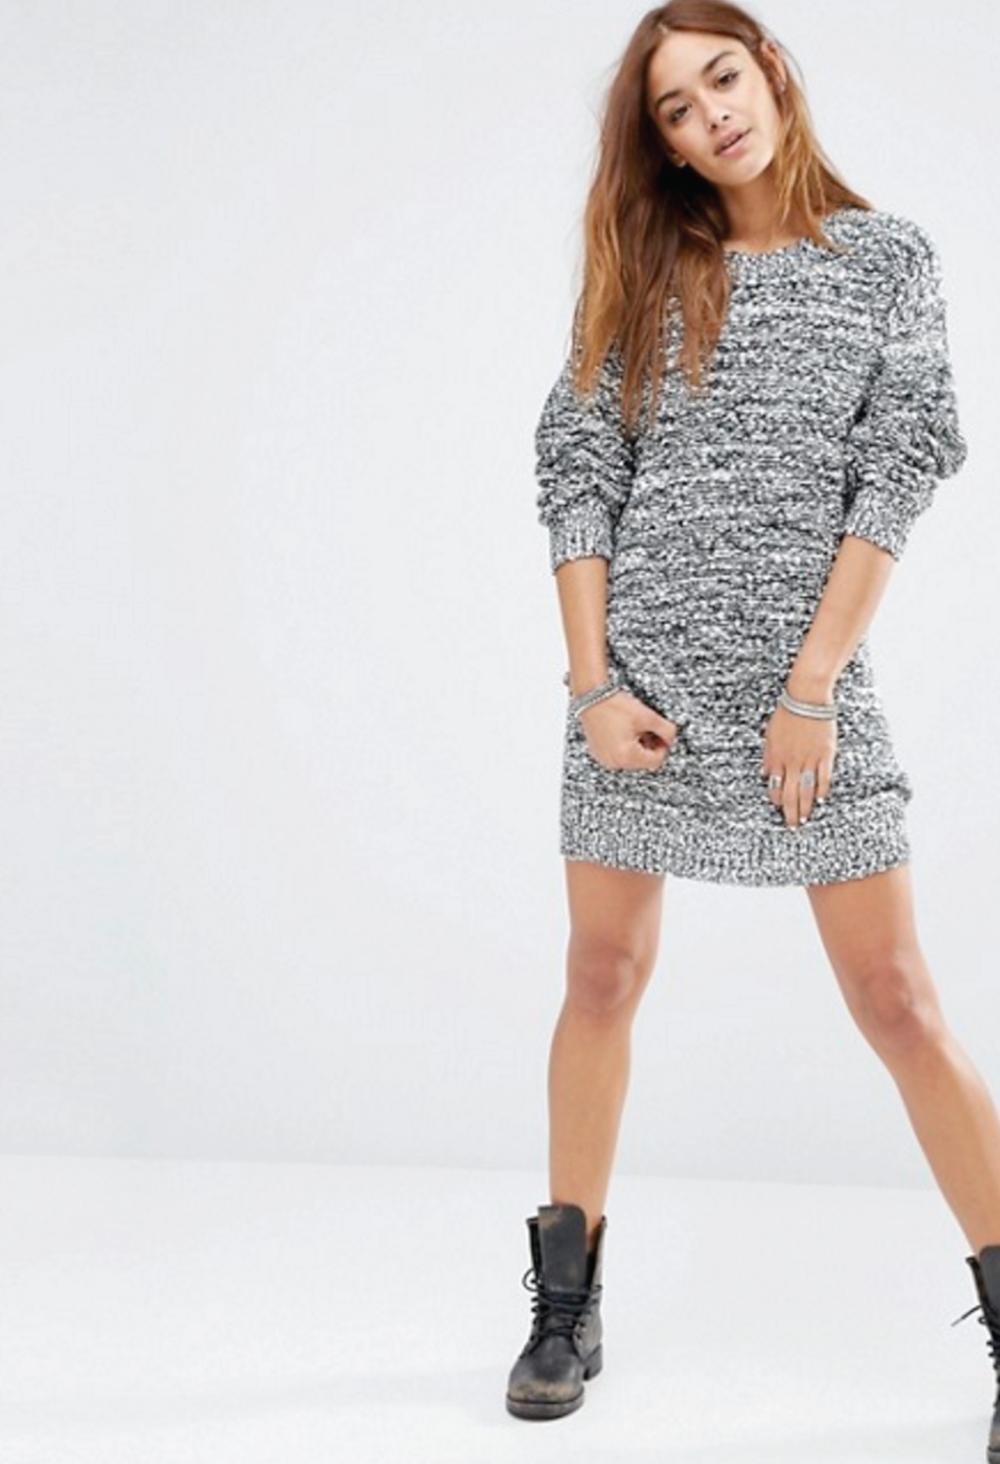 honestly, though grey oversized sweater